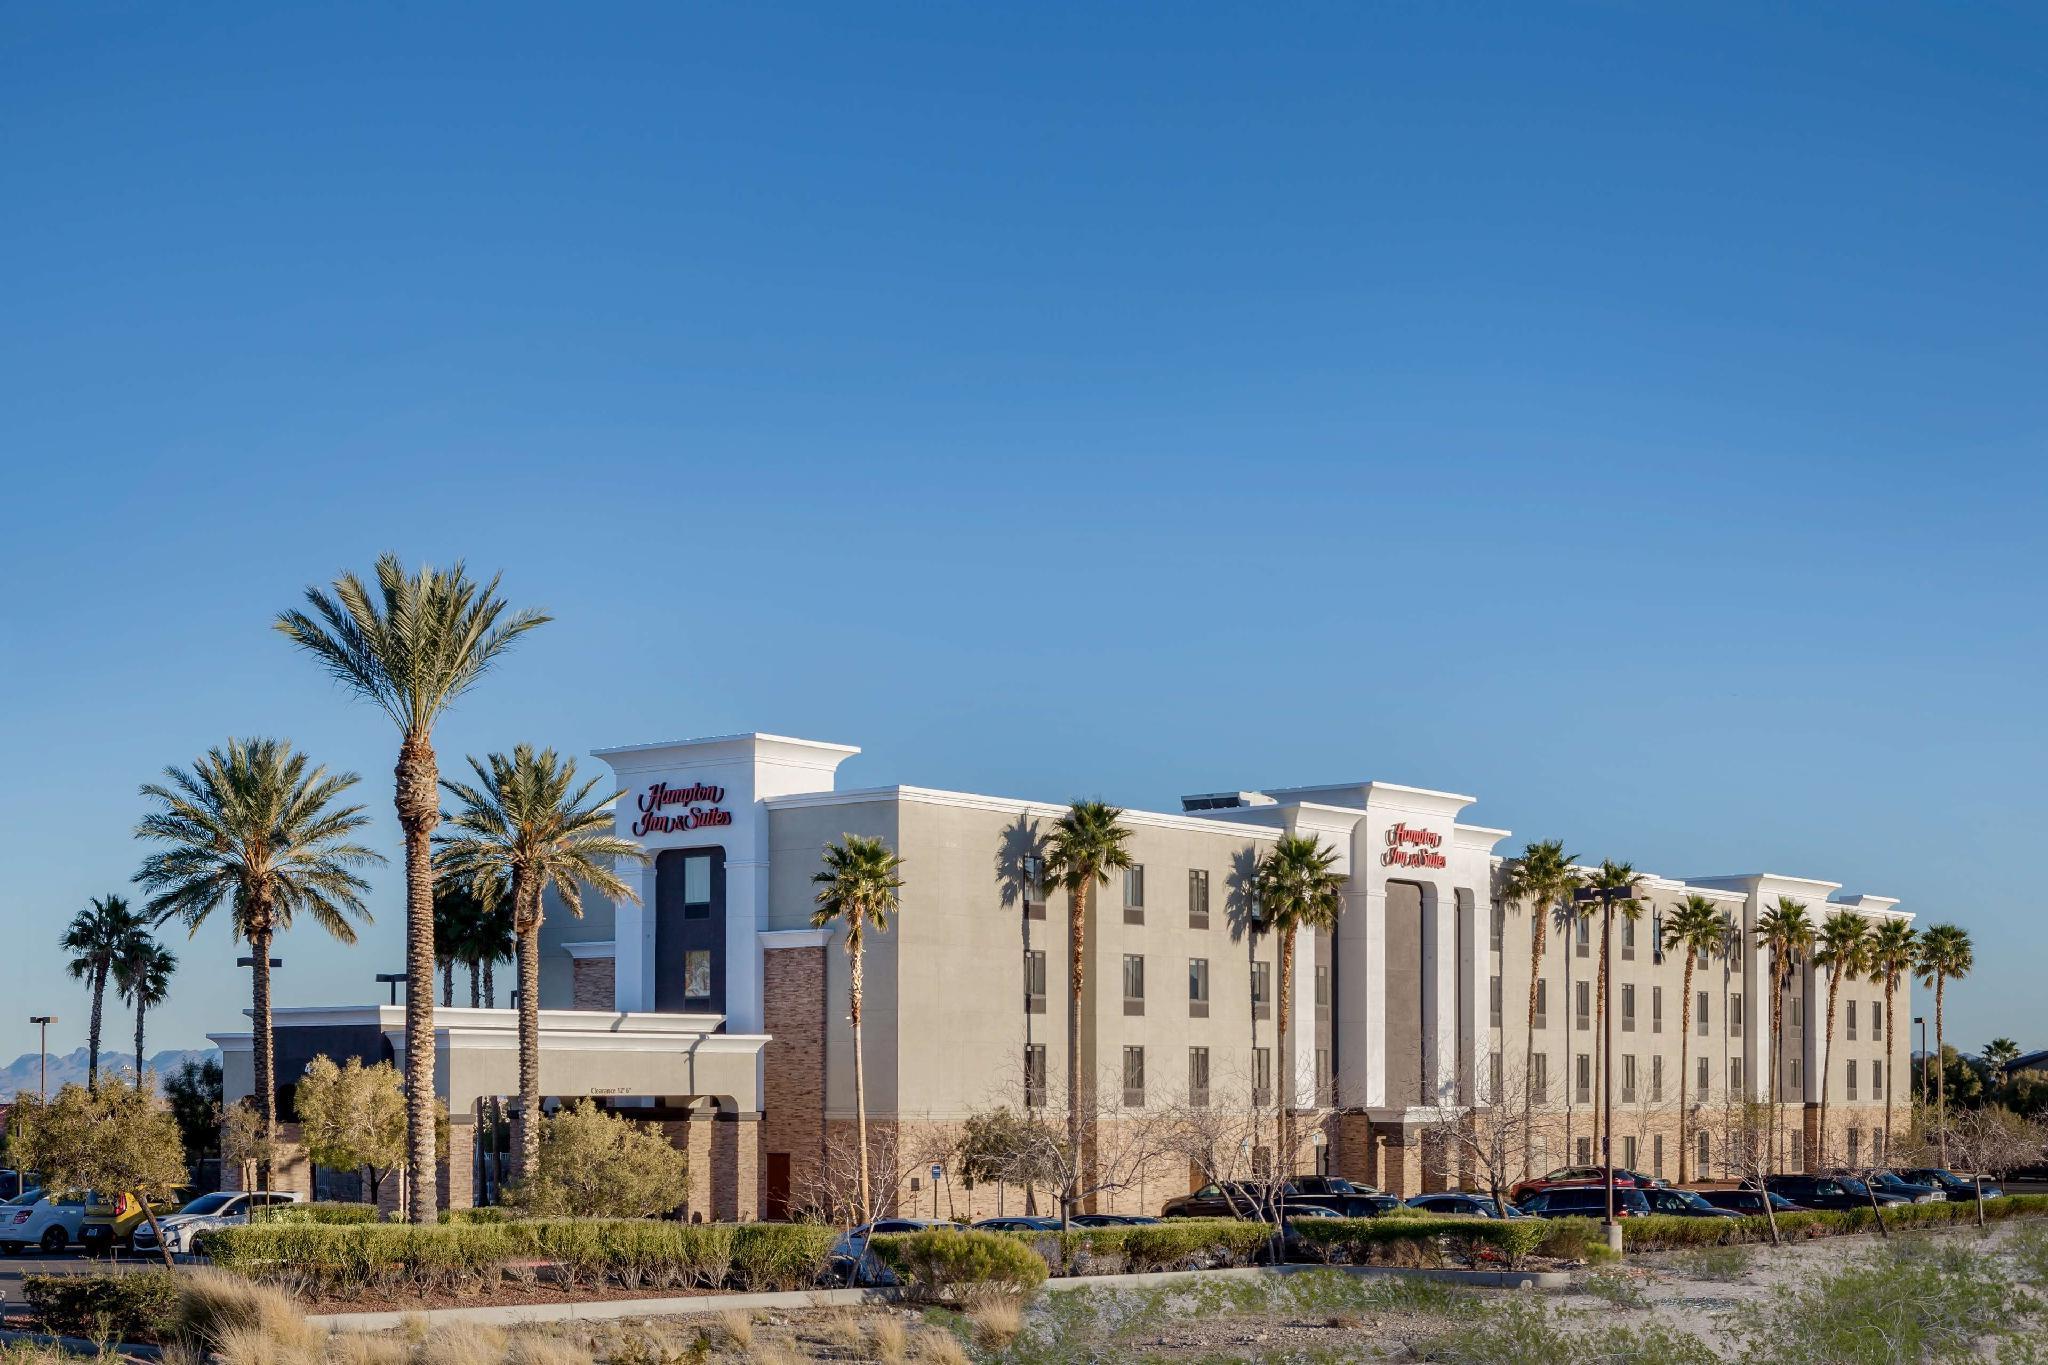 Hampton Inn and Suites Las Vegas West Summerlin, Clark